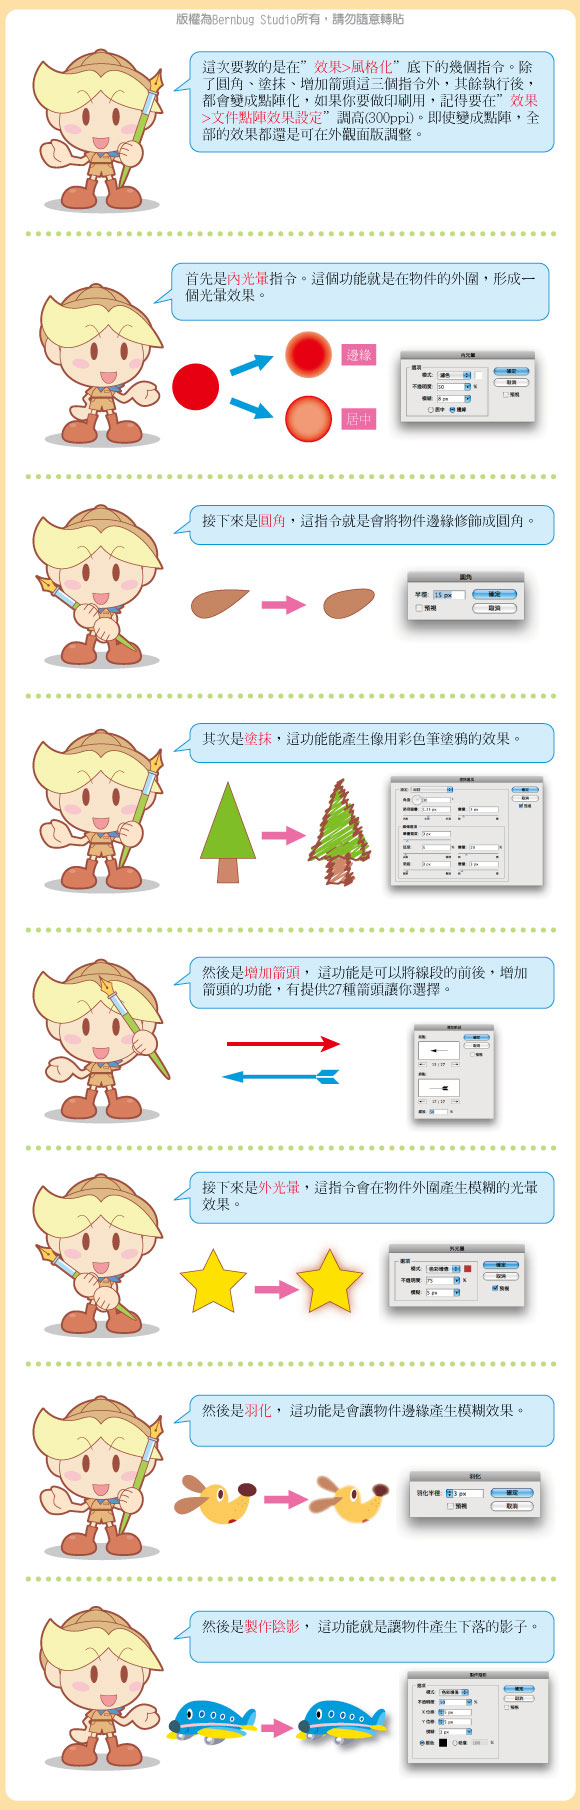 lesson21.jpg